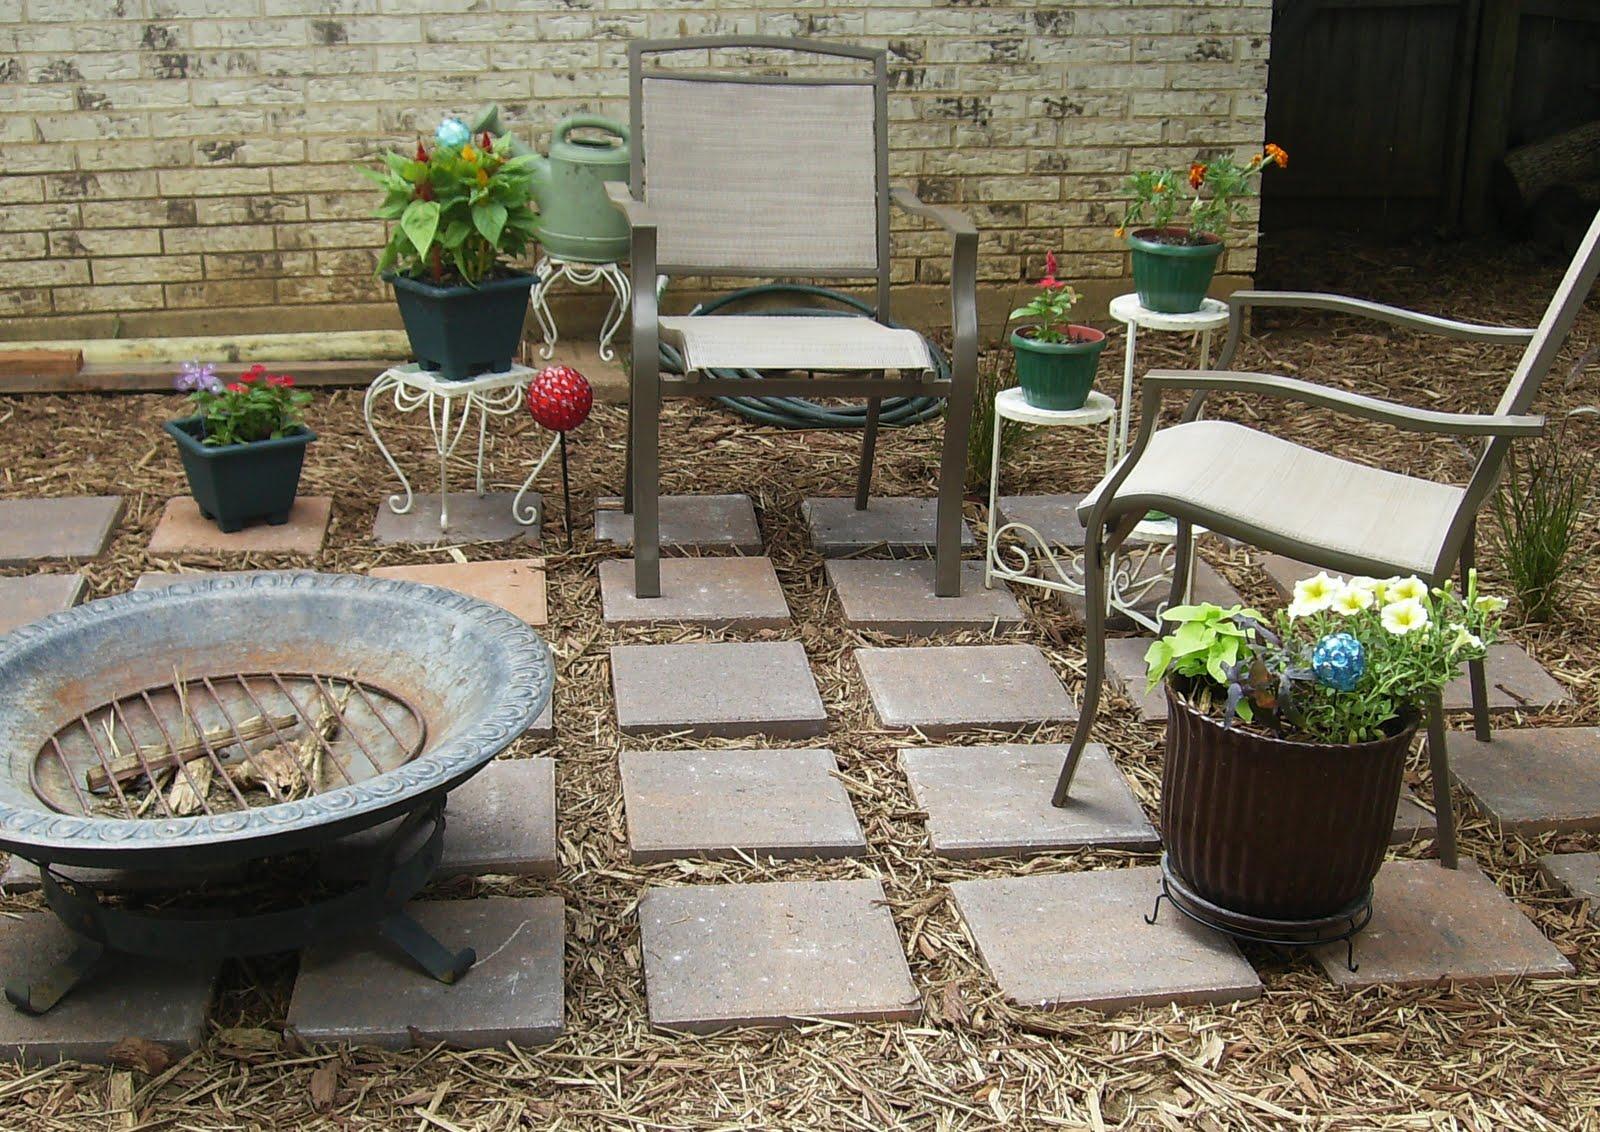 Support Blog for Moms of BOYS!: DIY Backyard Oasis